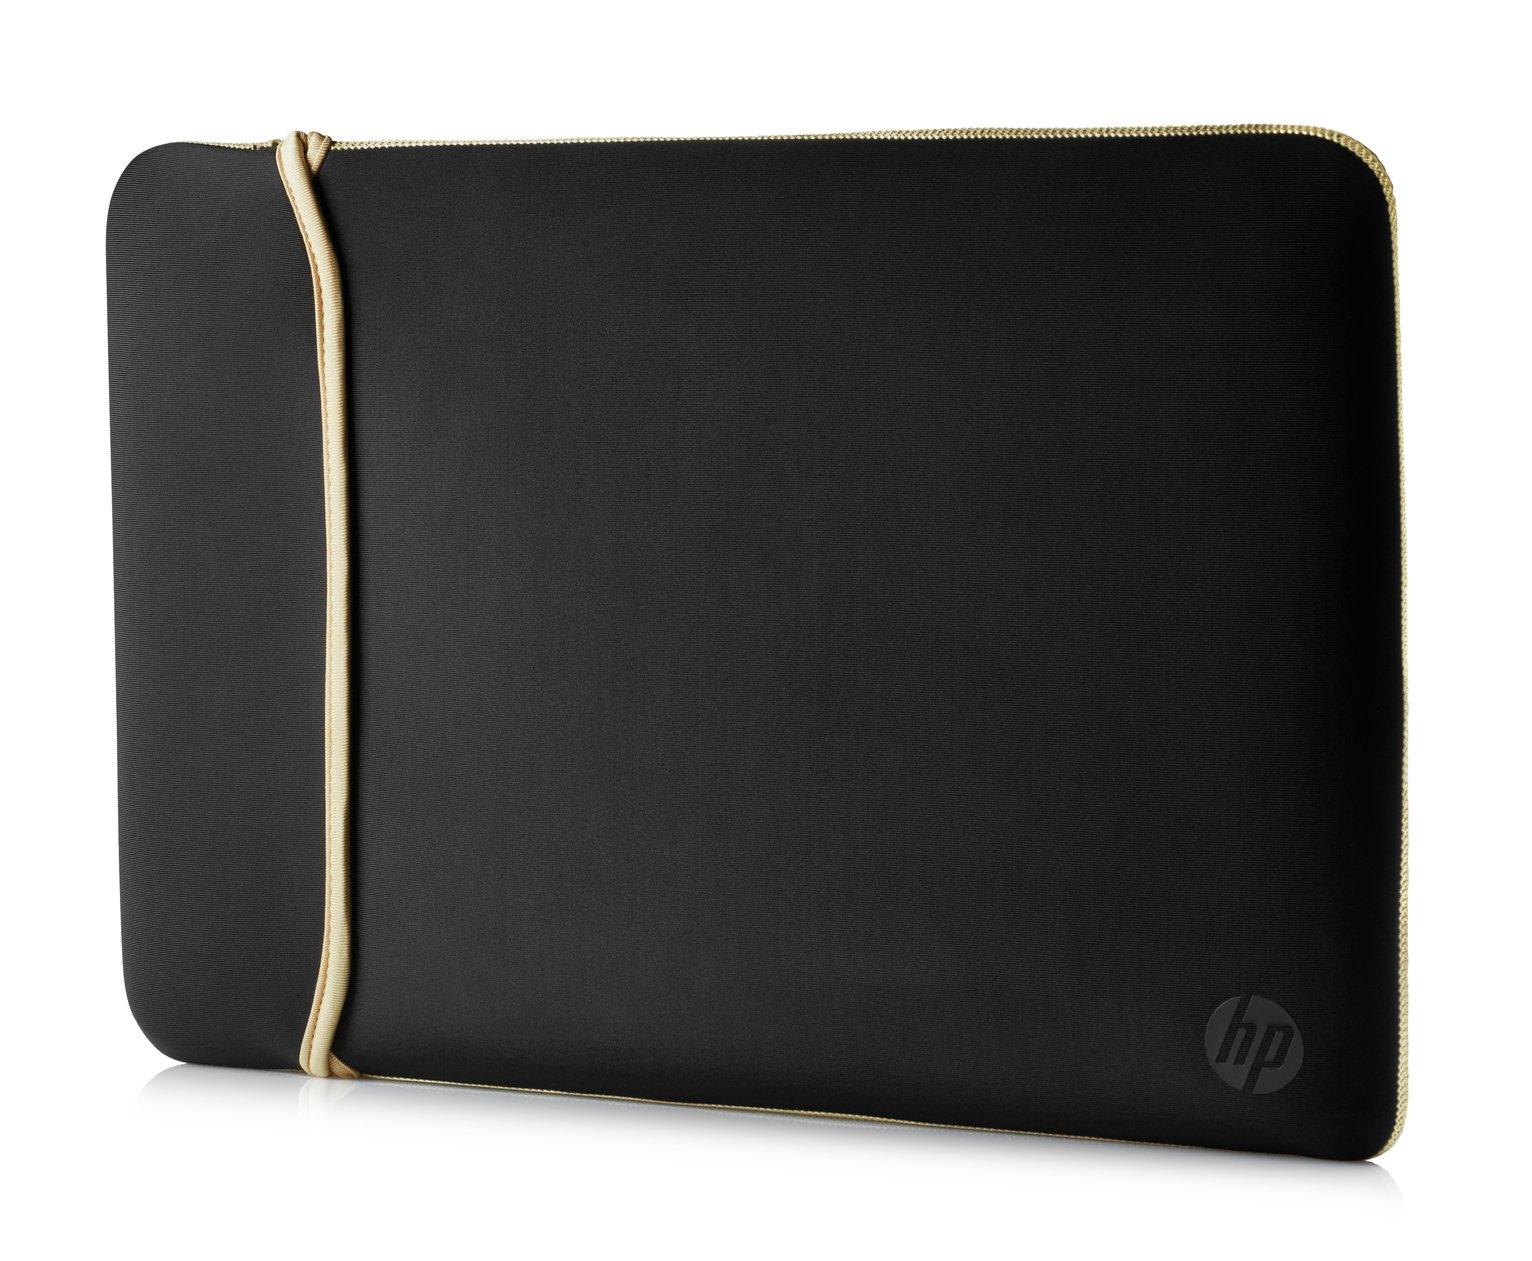 HP 14 Inch Reversible Laptop Sleeve - Gold & Black